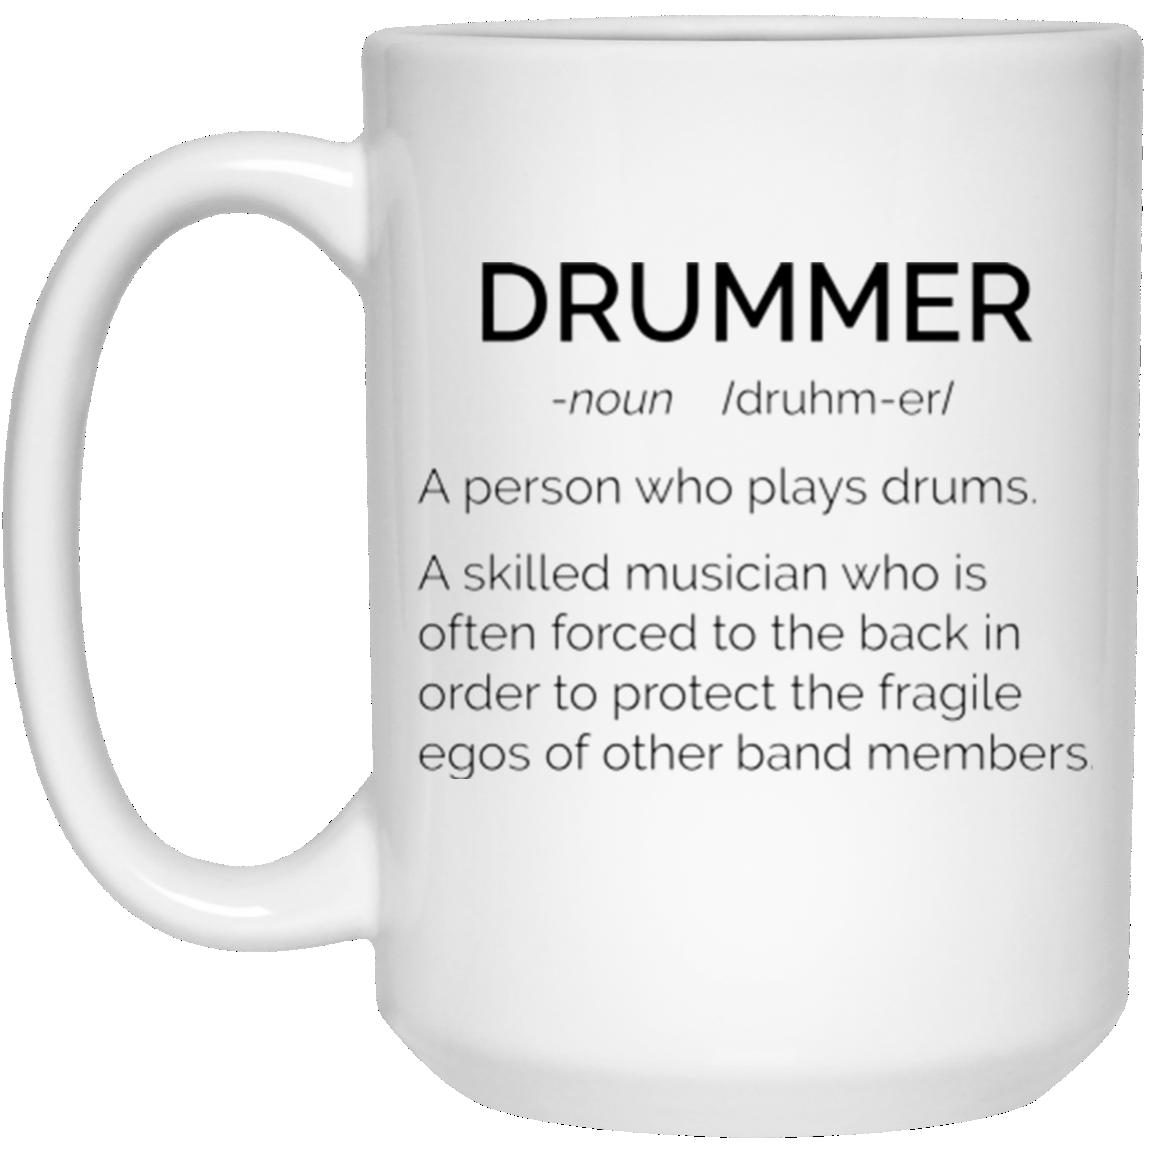 image 19 - Drummer Definition mug: Skilled musician always force to the back